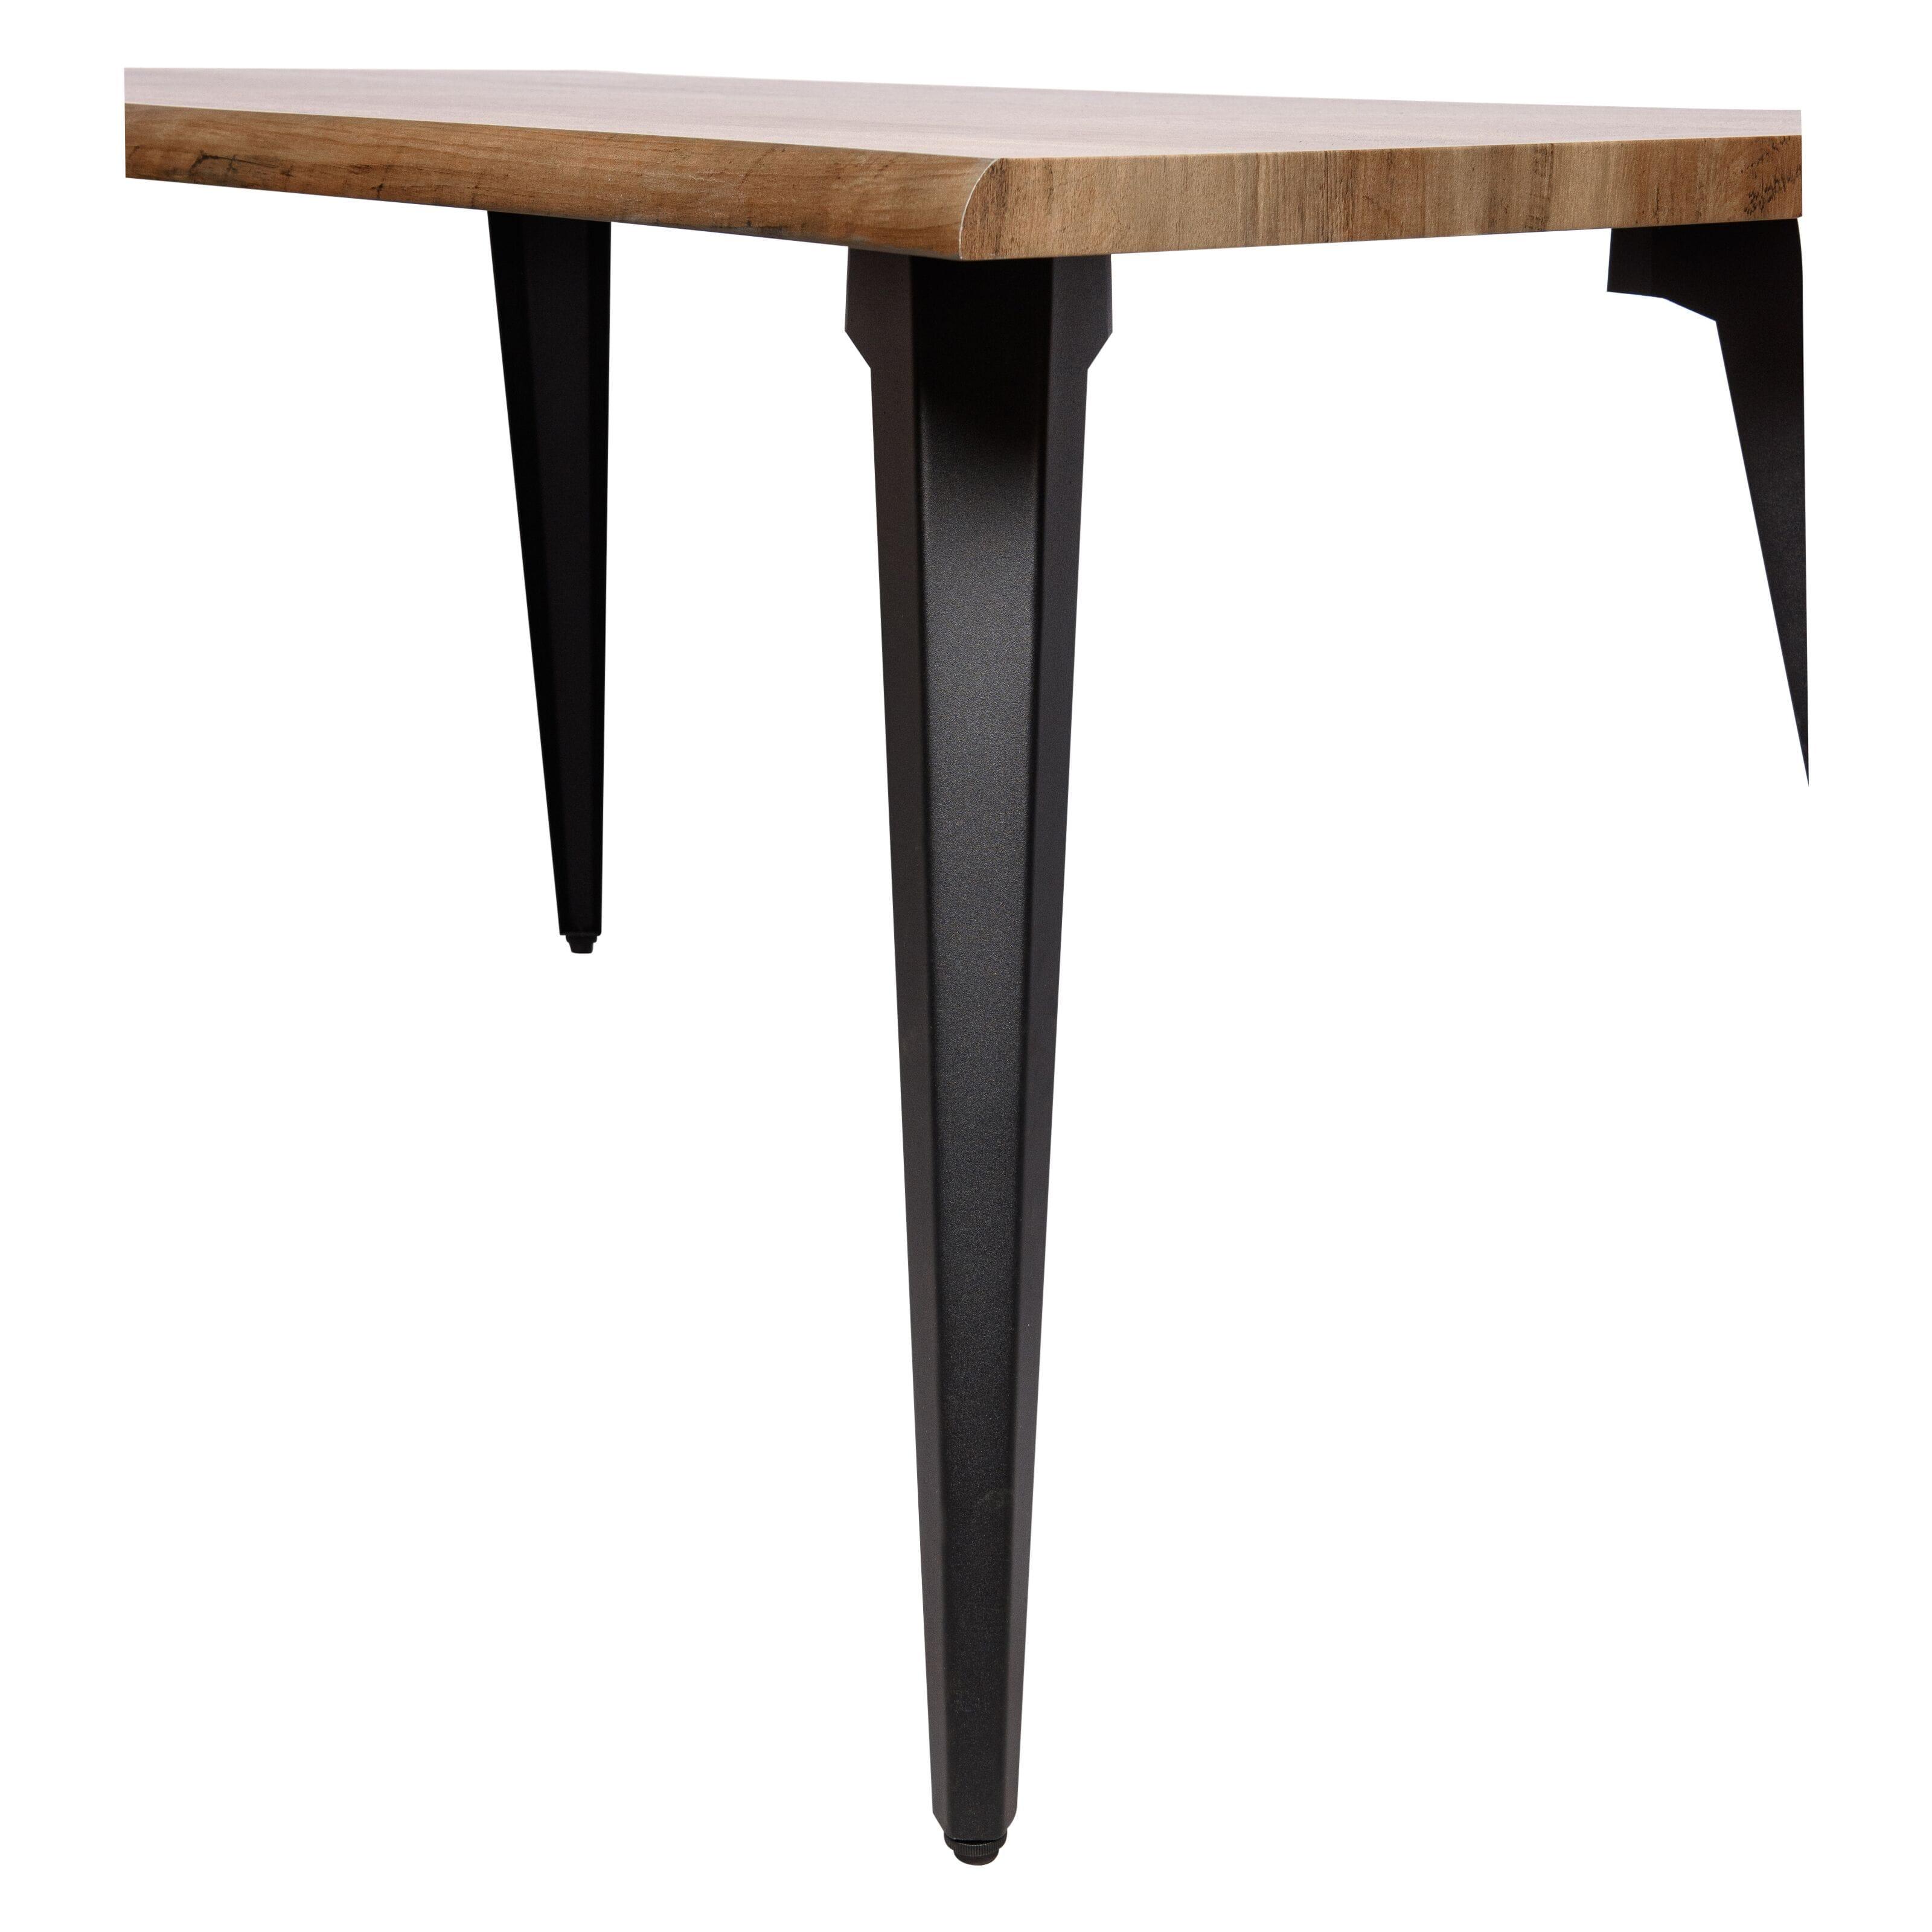 Ravenna Dark Brown Modern Rectangular Wood 63 Dining Table W Metal Legs By Leisuremod